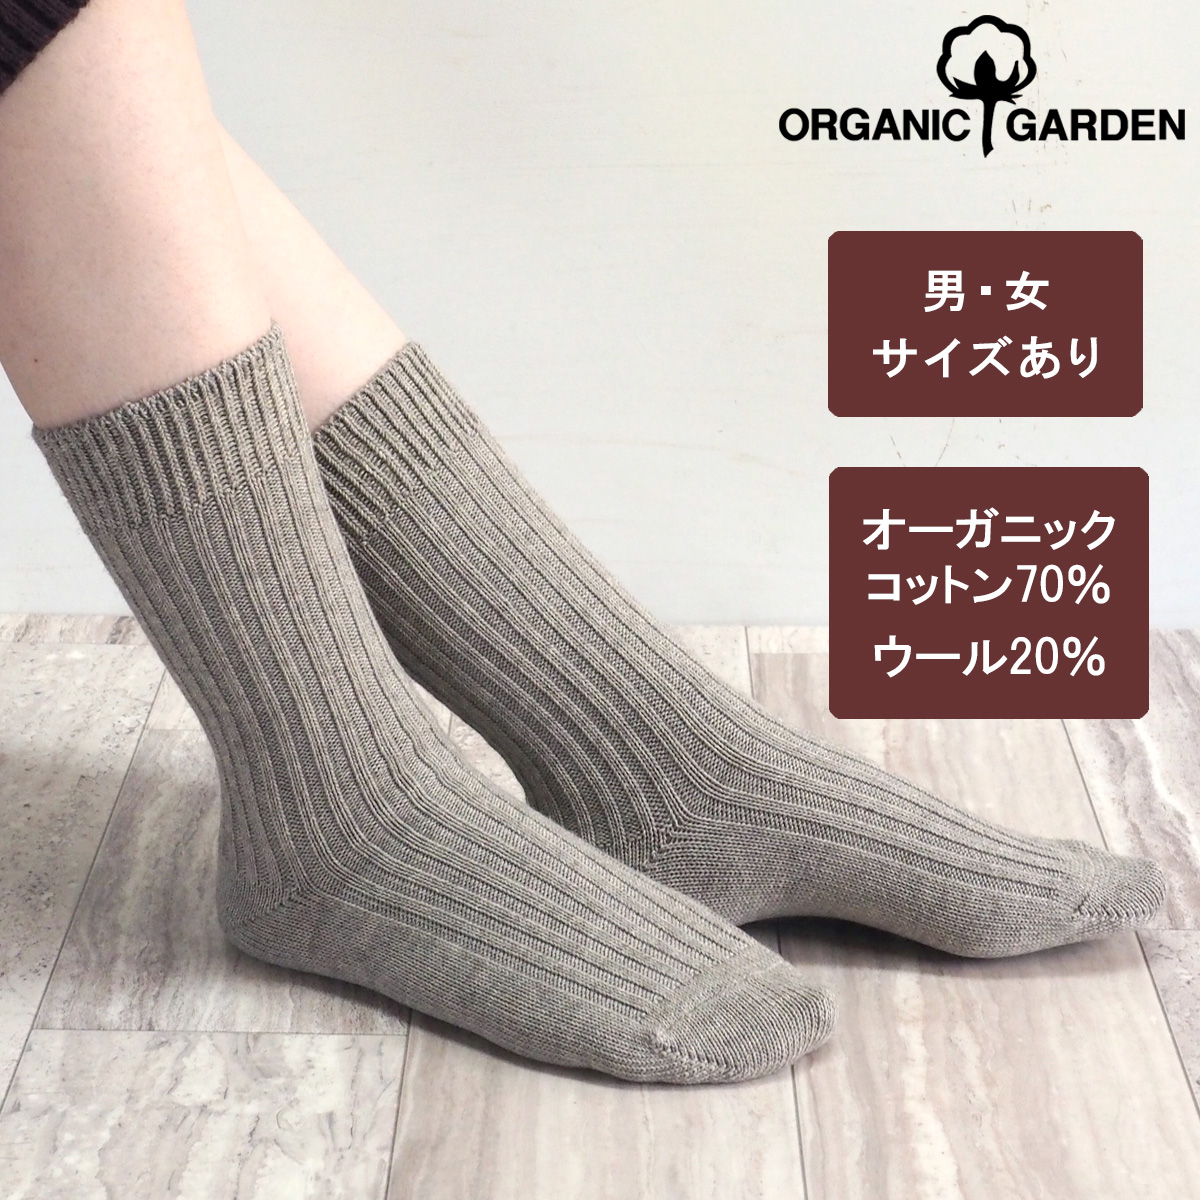 ORGANIC GARDEN(オーガニックガーデン) ヤクウール×スーピマコットン リブ編みソックス レギュラー丈 メンズ・レディース [NS8257]